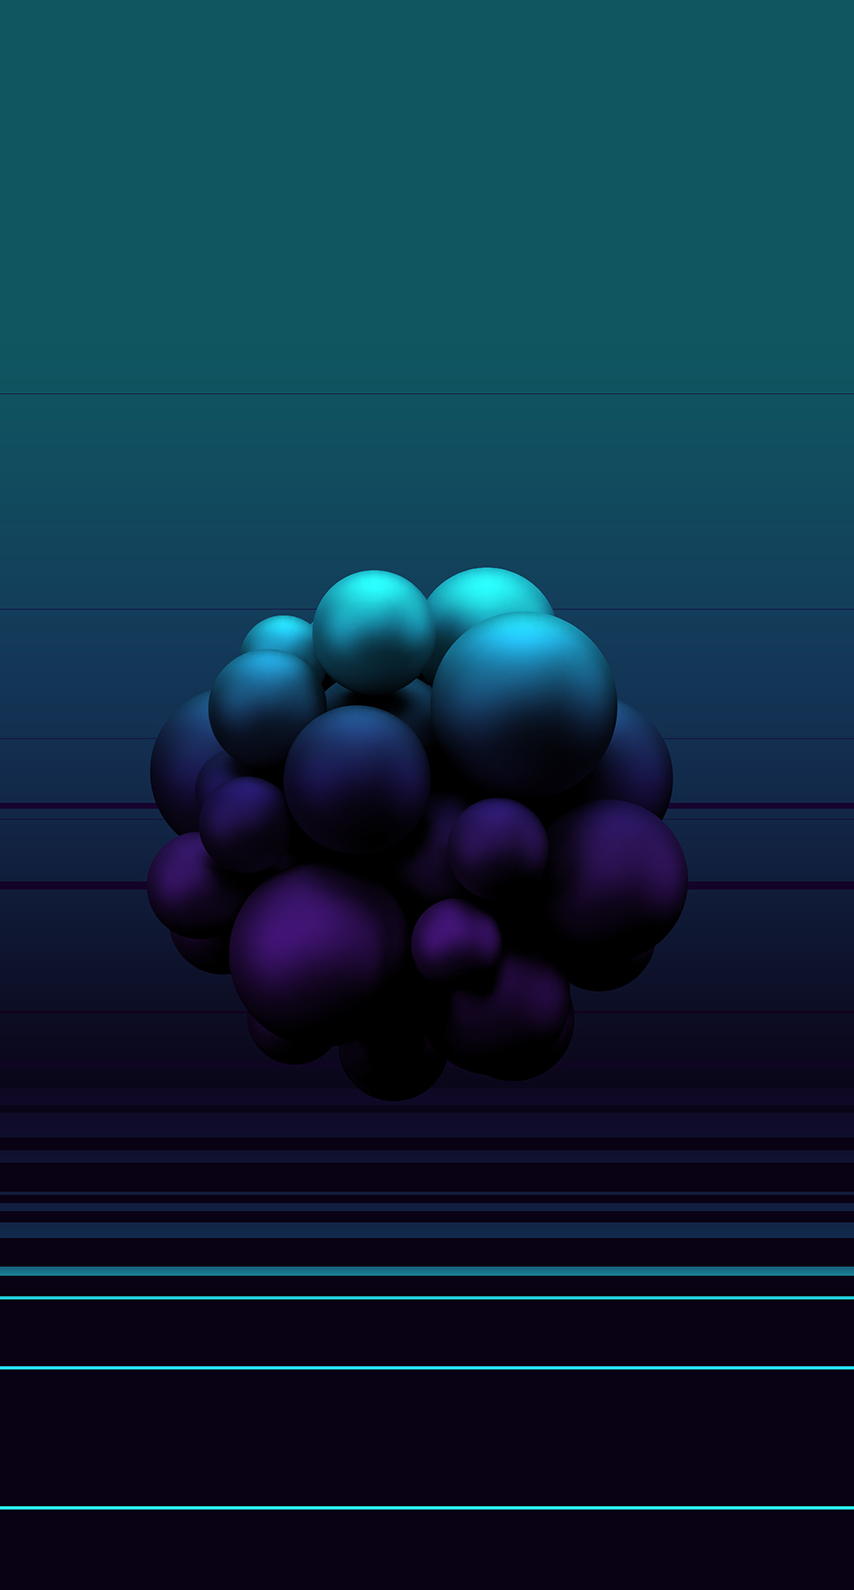 ball, design